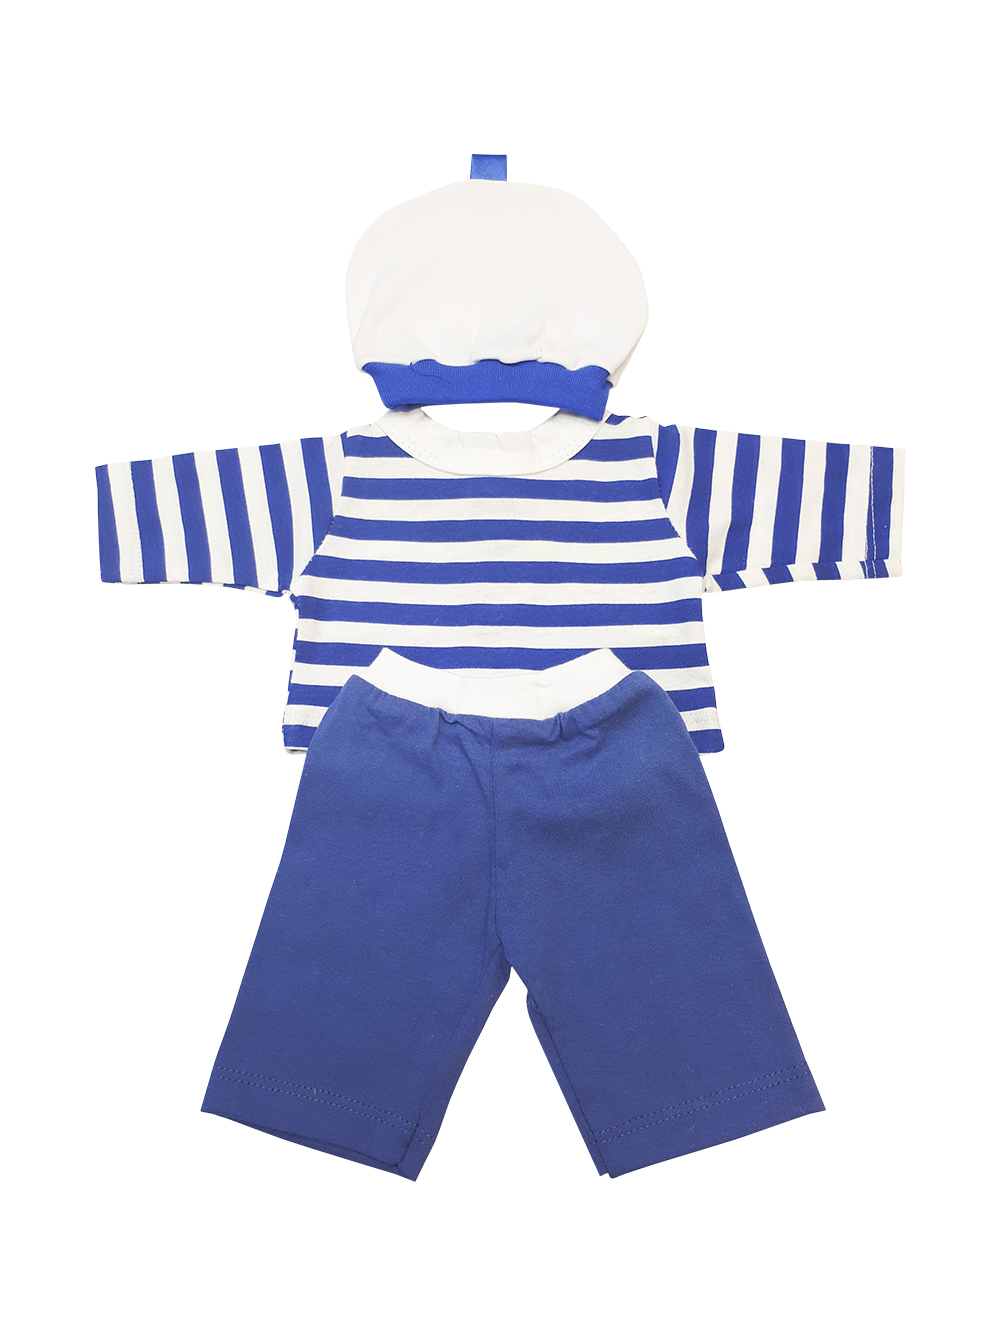 Набор одежды для кукол КоЛибри Костюм Морячок Колибри 30 белый синий цветы фото